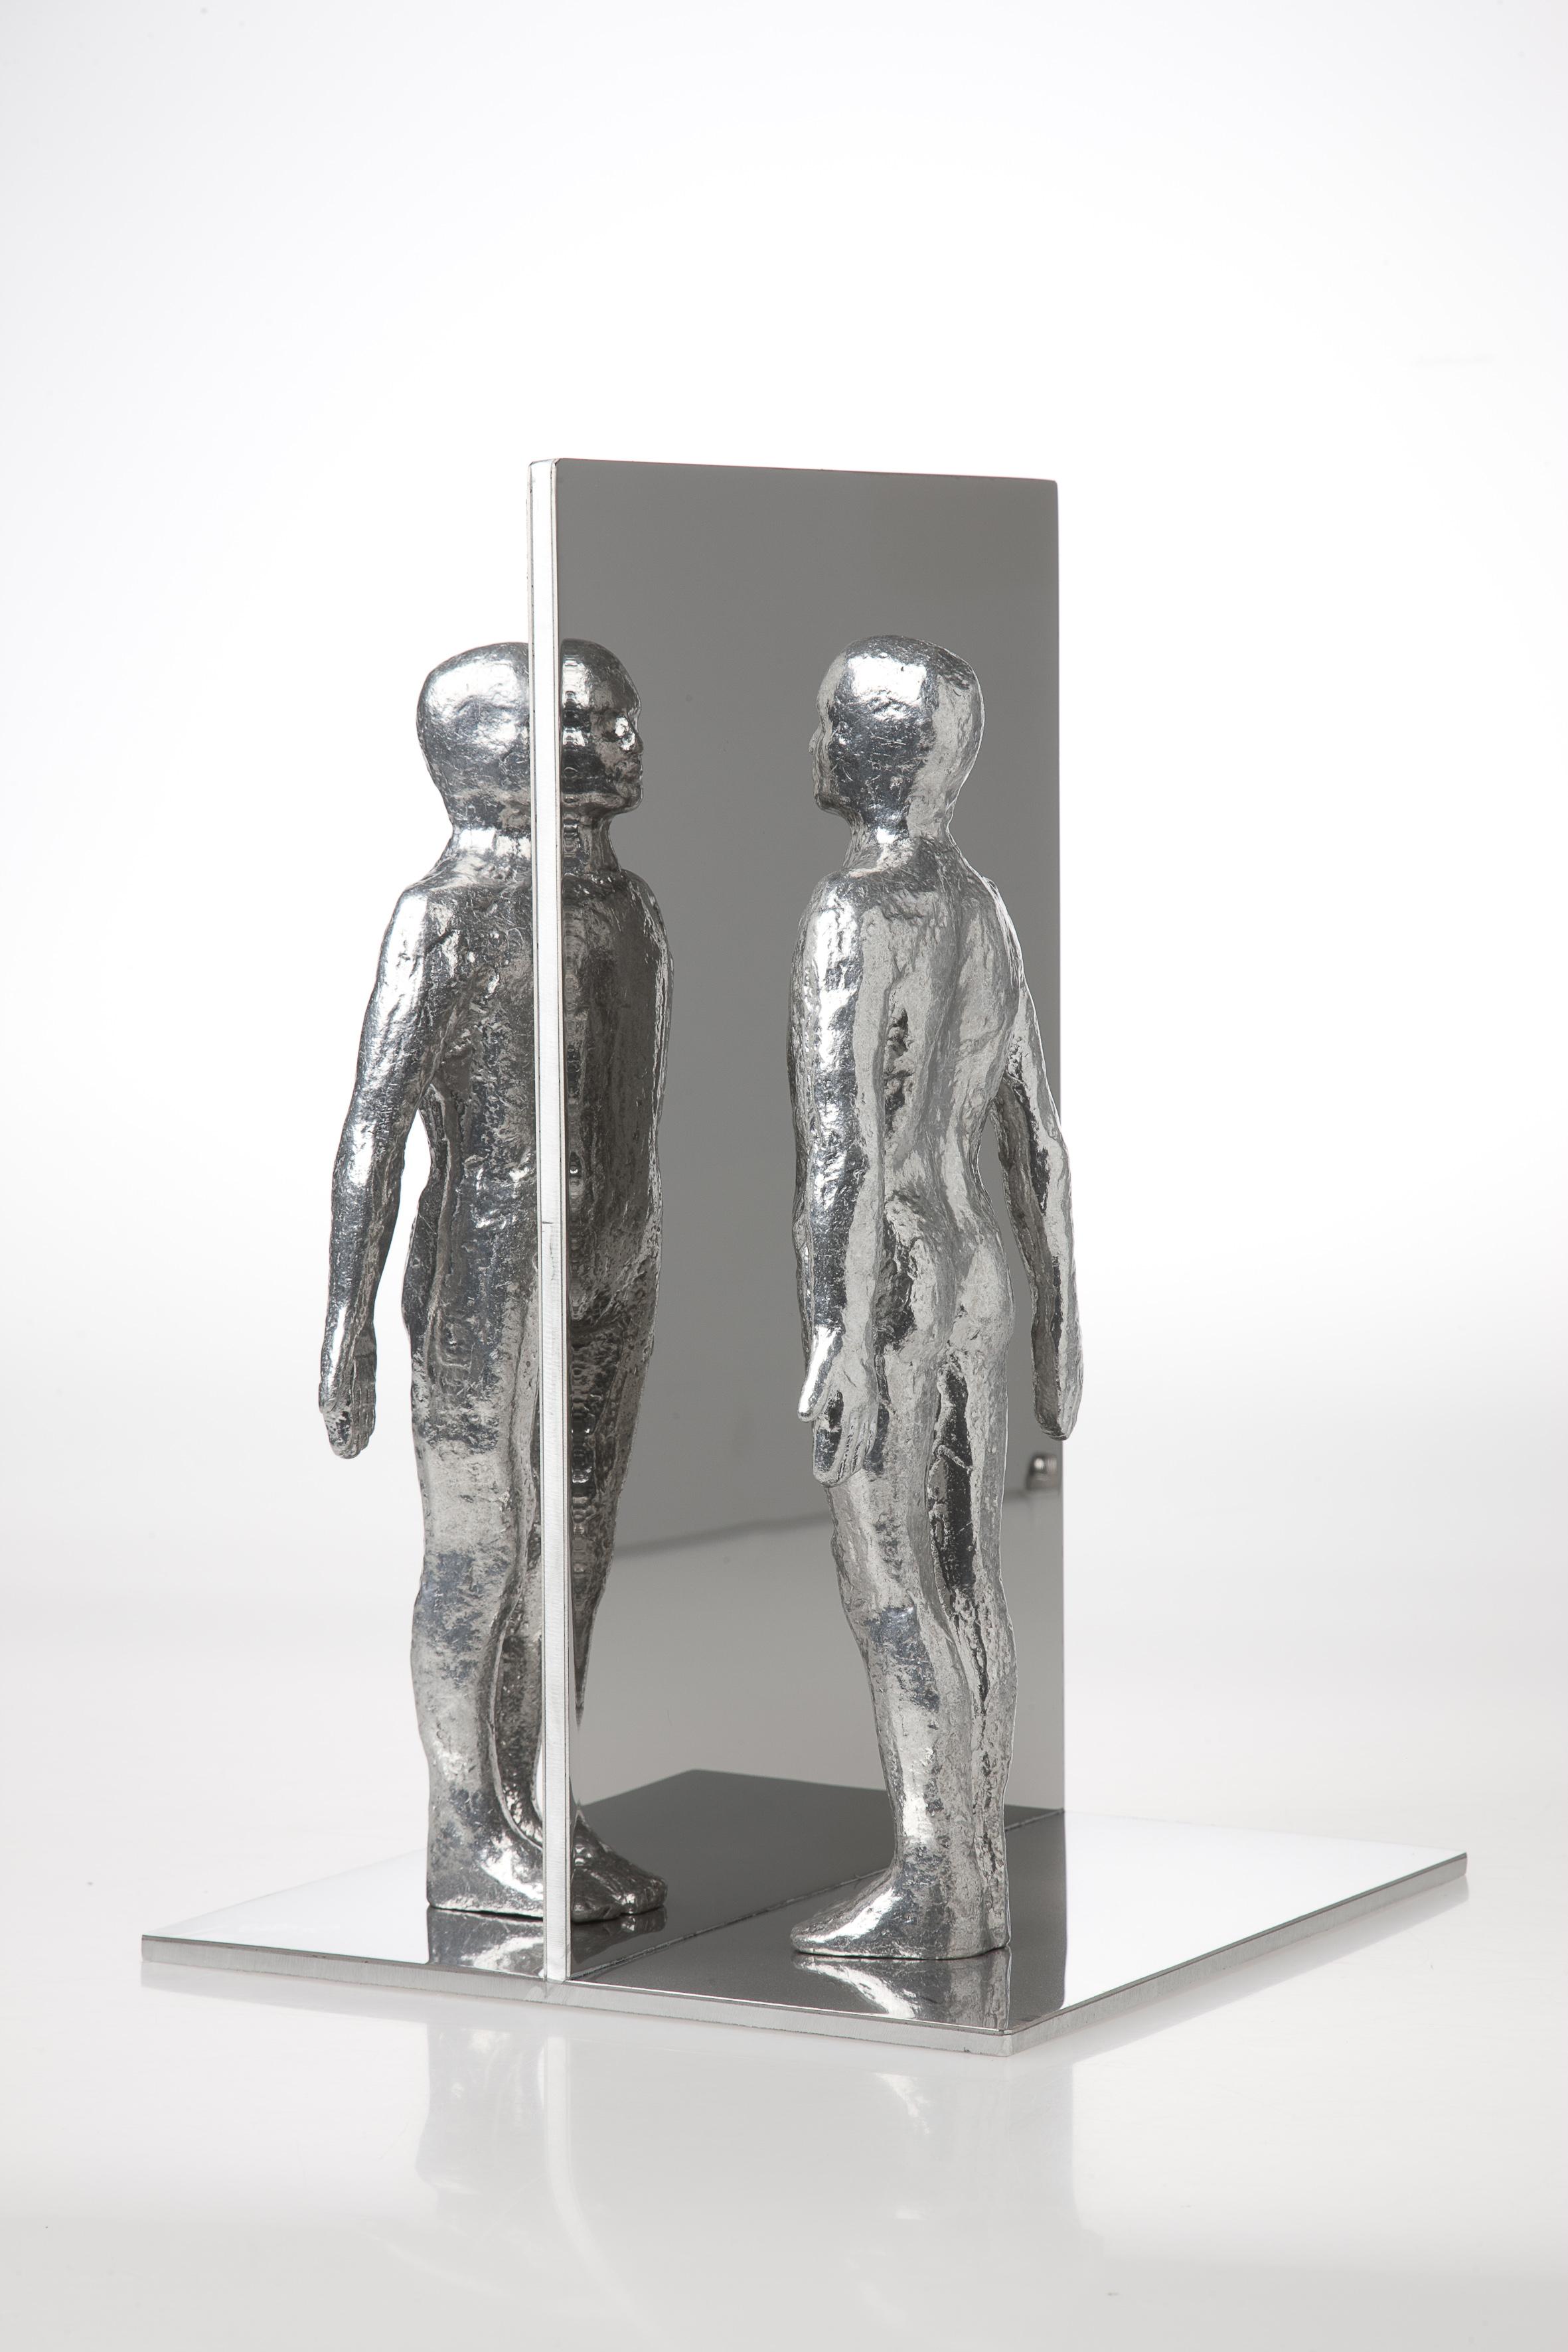 Mirror. 2011.